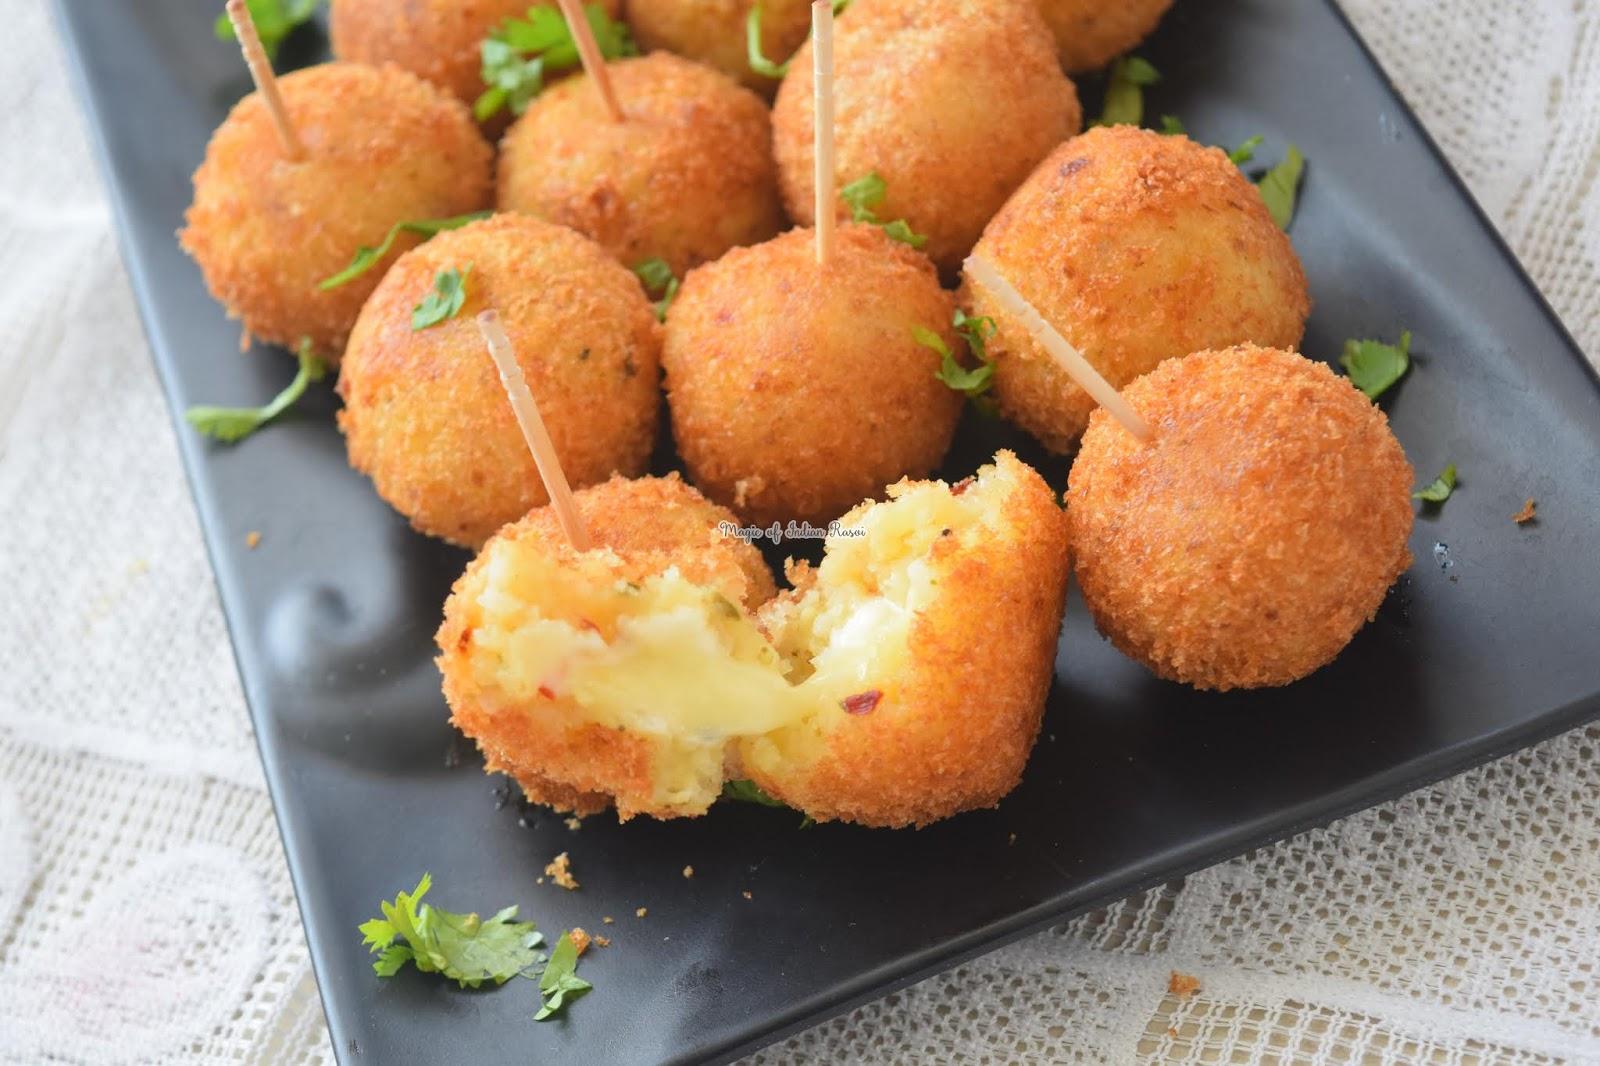 Poha Potatoes Cheese Croquettes Recipe - पोहा आलू चीज़ बॉल्स रेसिपी - Priya R - Magic of Indian Rasoi